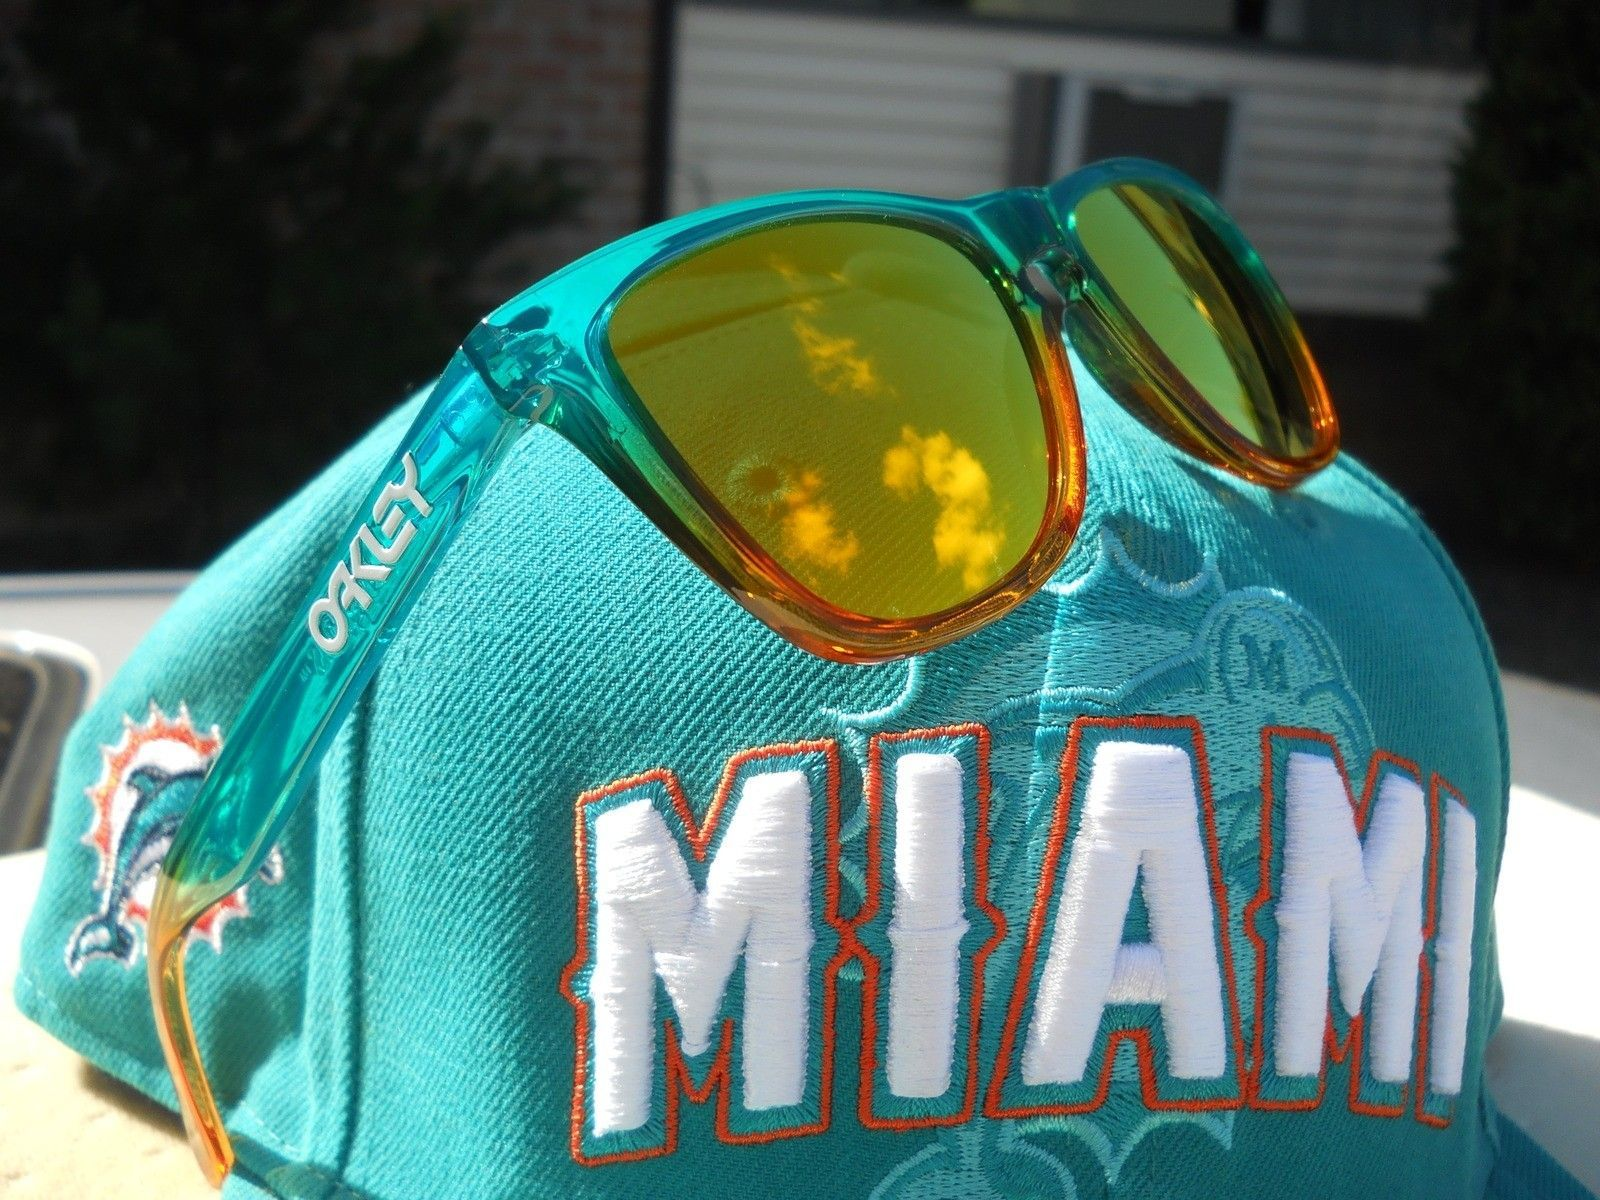 Miami ... - lkl5.jpg